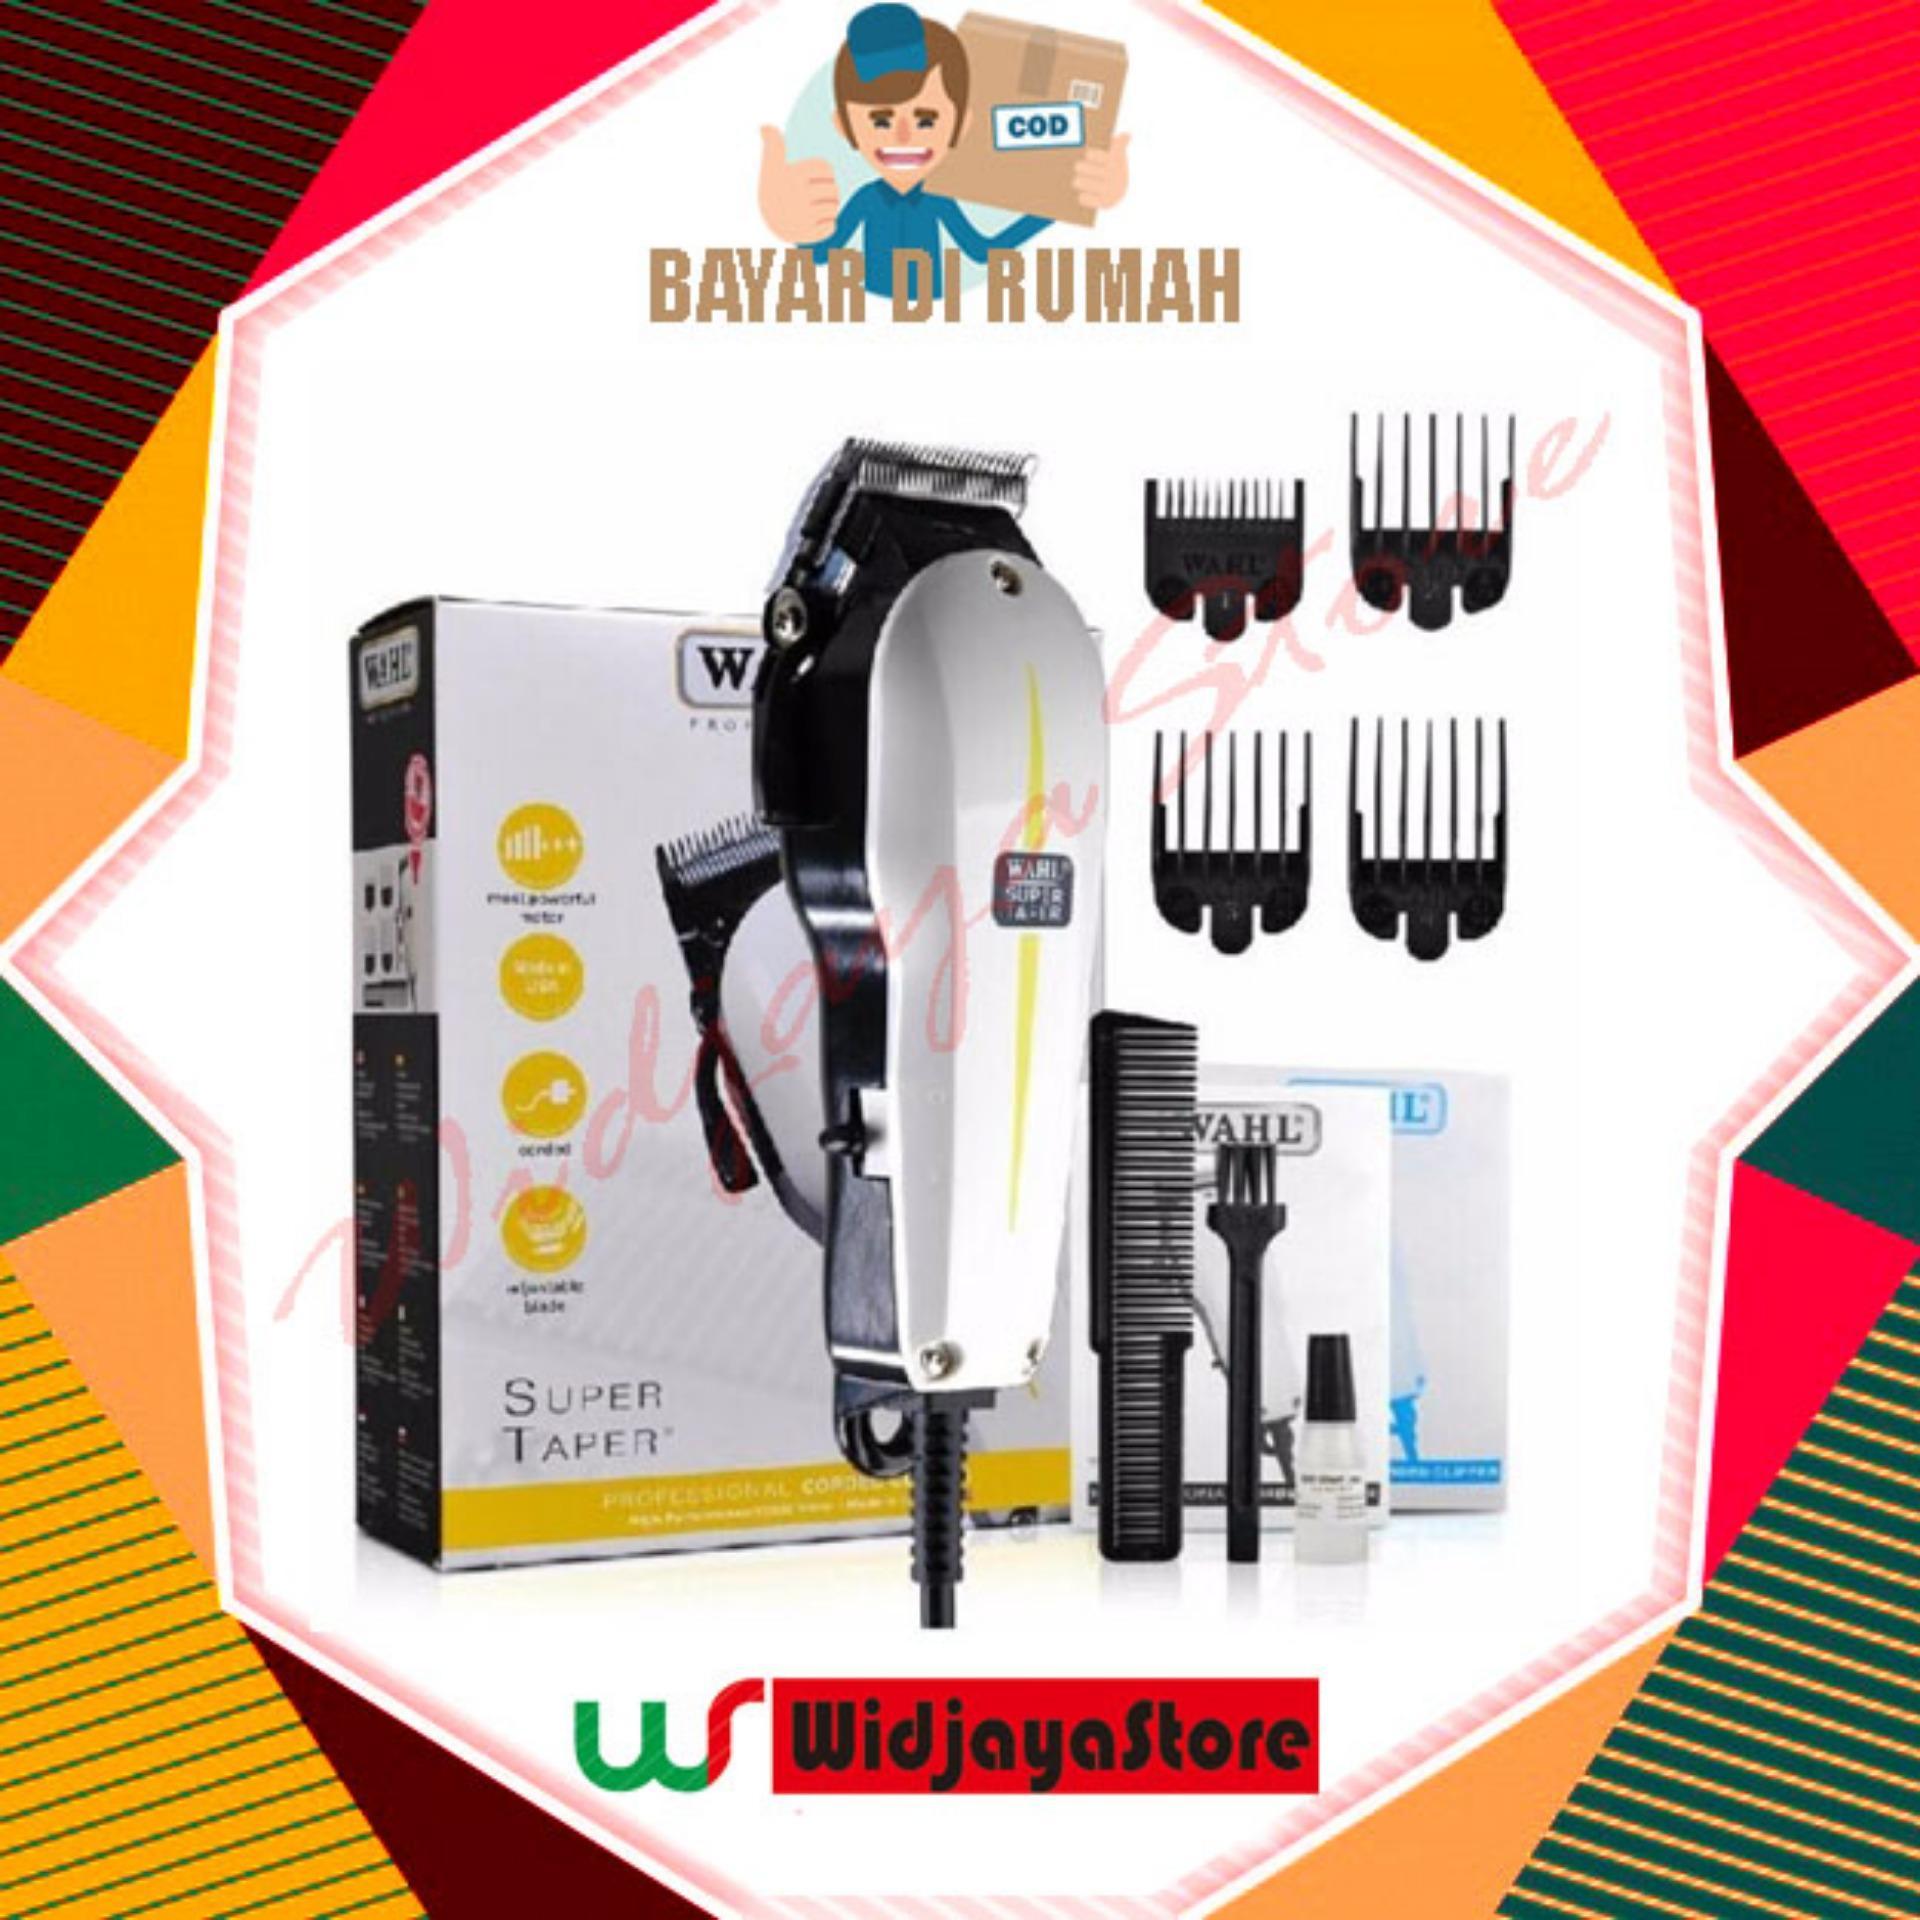 ALAT PANGKAS CUKUR RAMBUT PROFESSIONAL WAHL SUPER TAPER HAIR CLIPPER b9e8e018c0